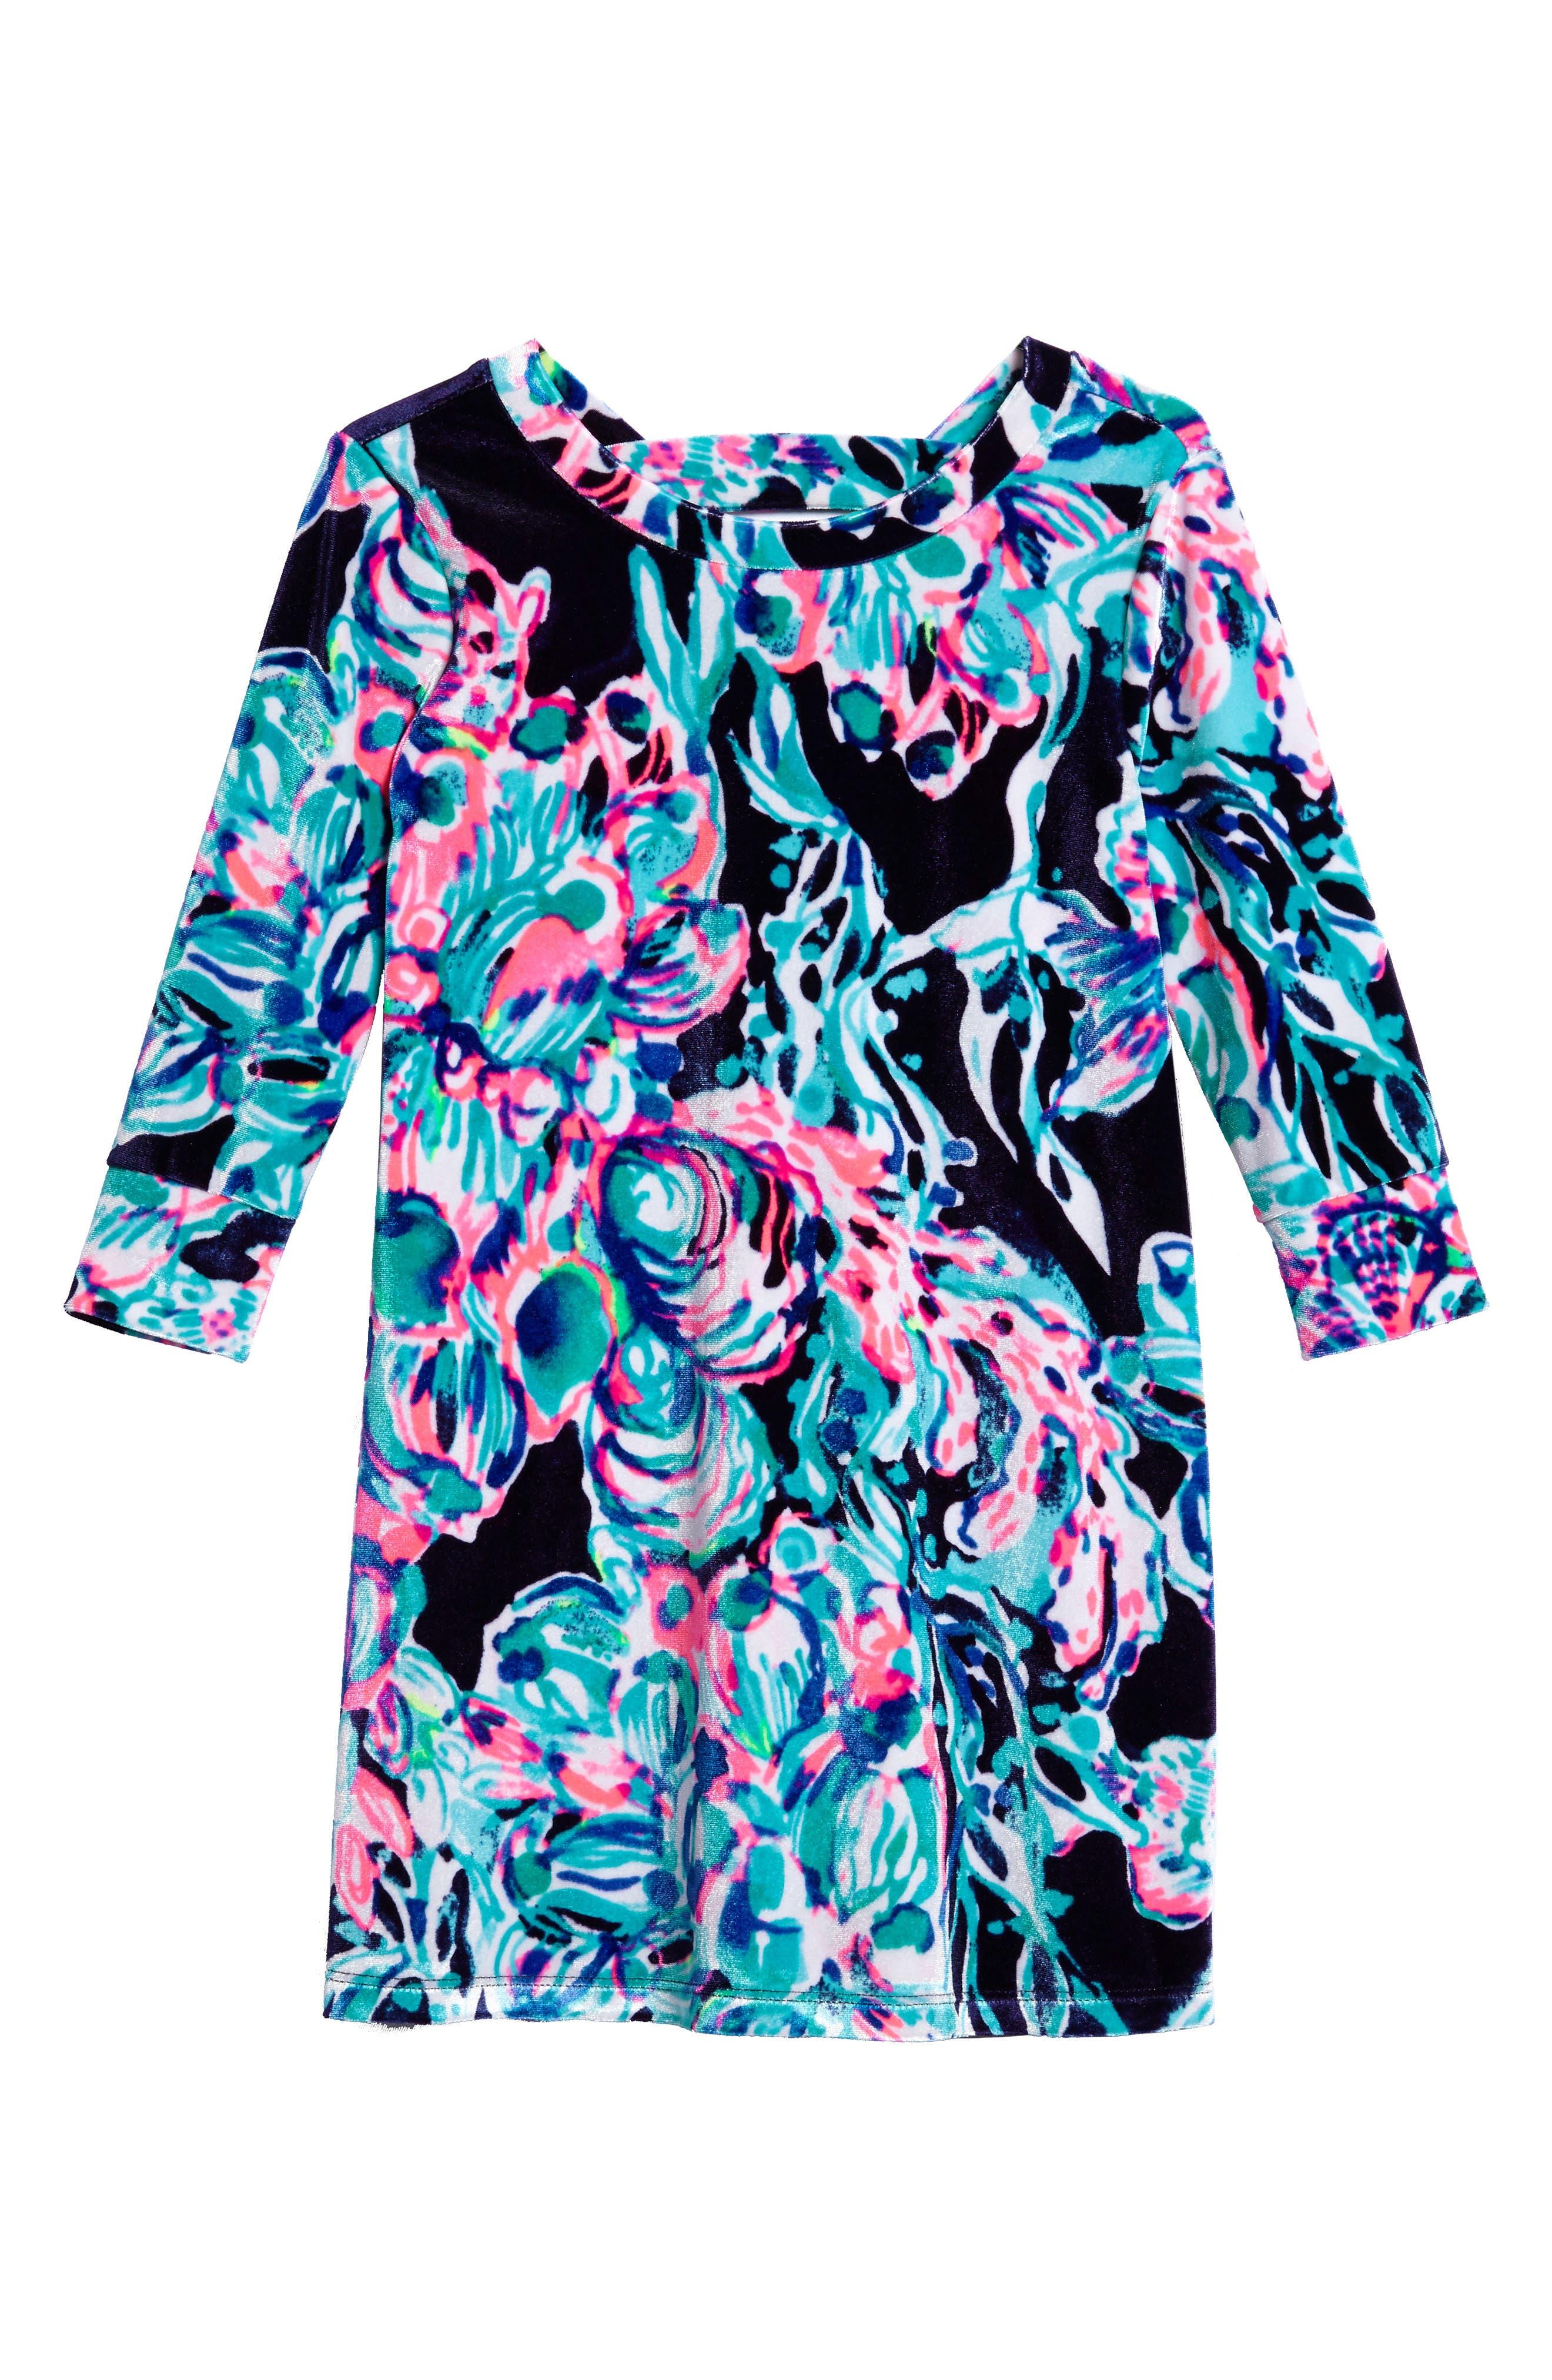 Main Image - Lilly Pulitzer® Mini Olive Velour Dress (Toddler Girls, Little Girls & Big Girls)